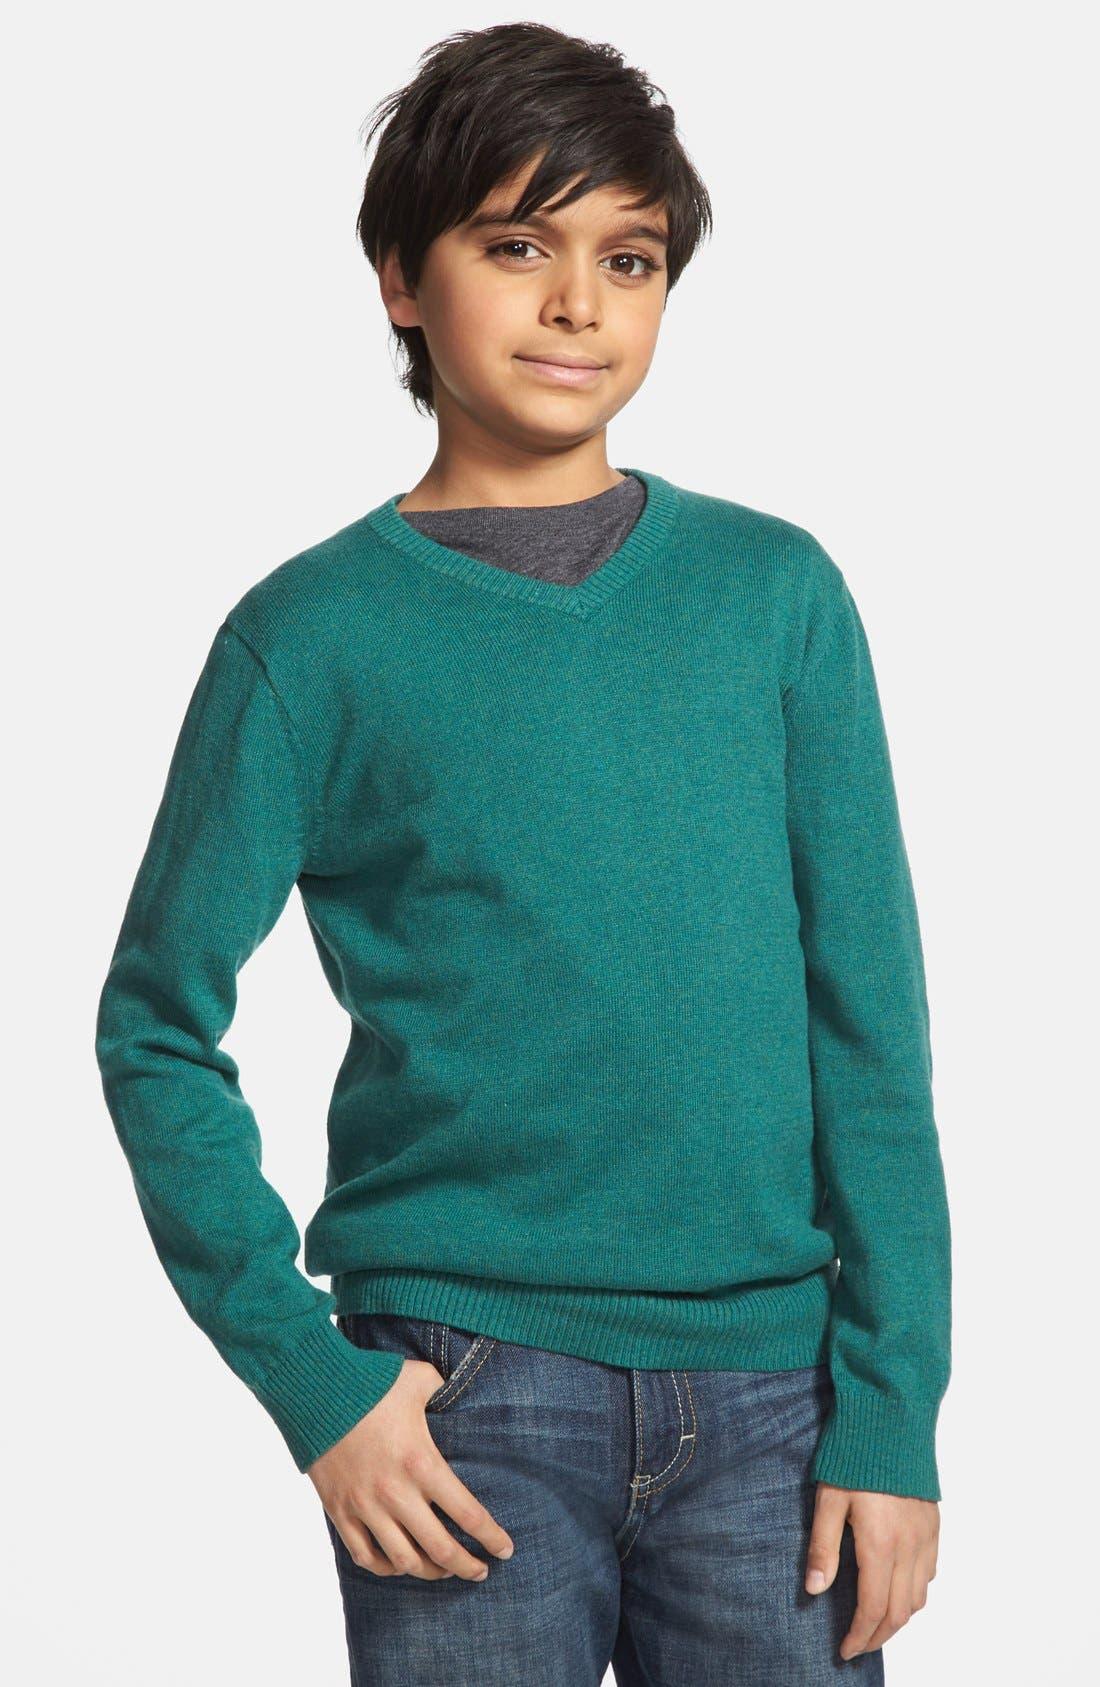 Main Image - Tucker + Tate 'Atticus' Cotton & Cashmere Sweater (Big Boys)